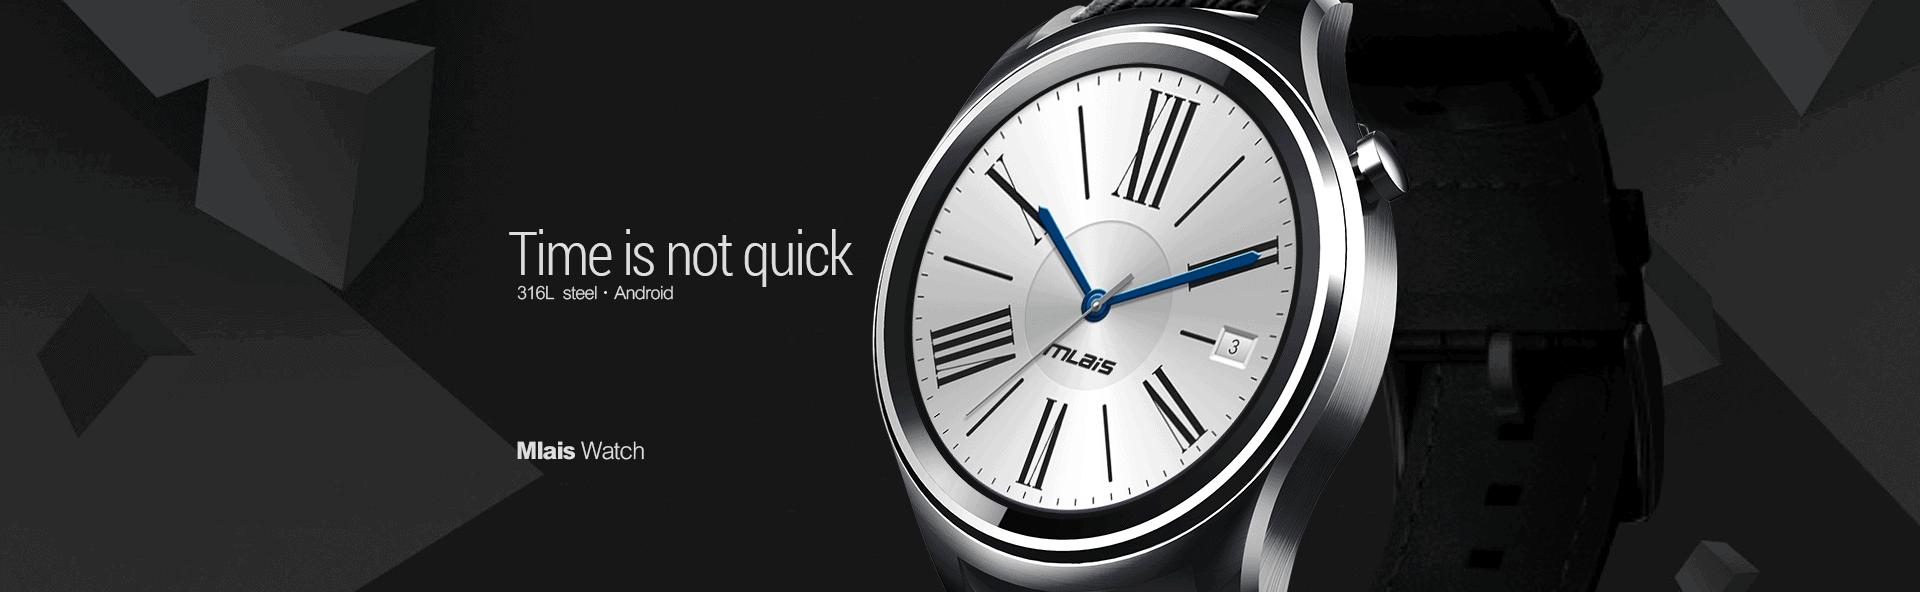 Mlais smartwatch 2015_2